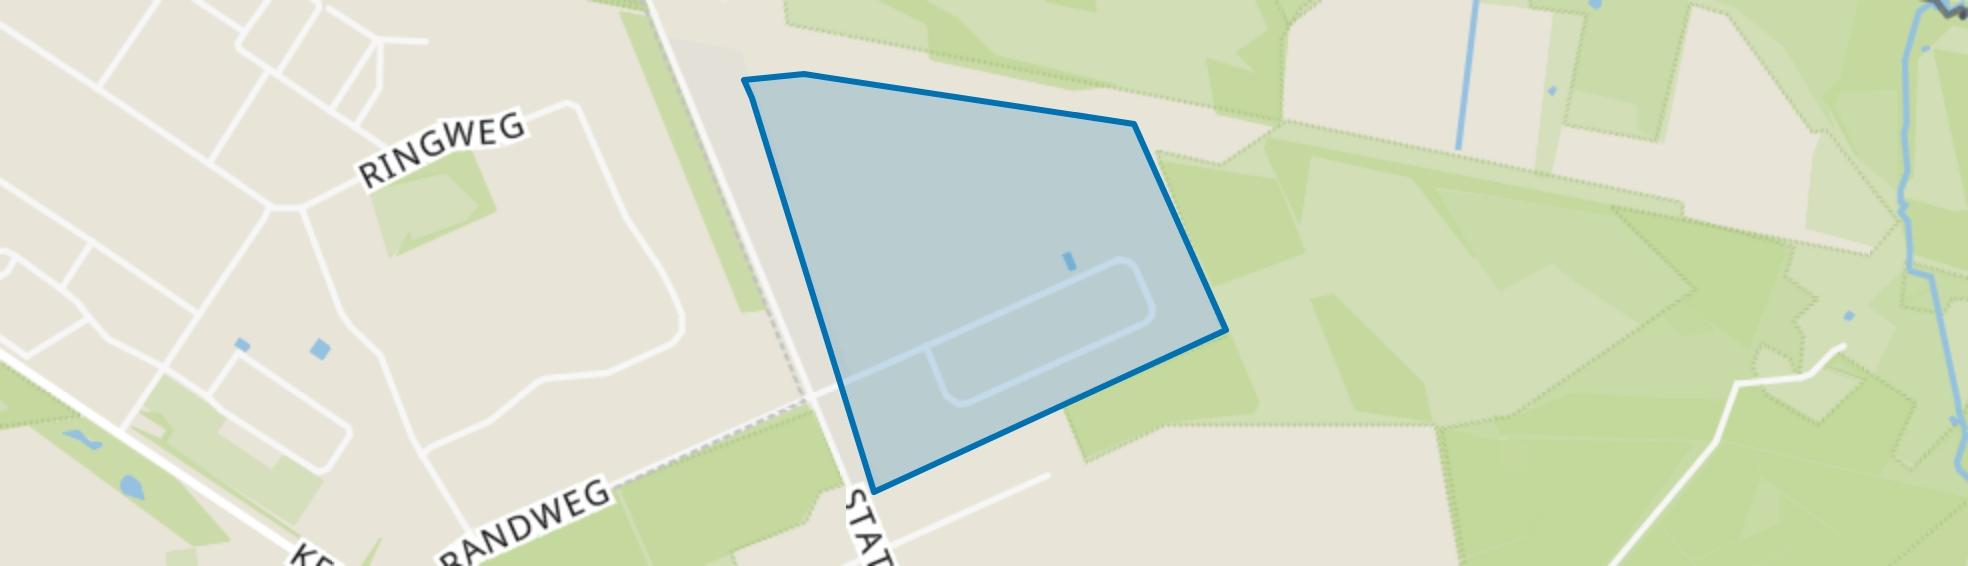 Bedrijventerrein Stationsweg, Herkenbosch map